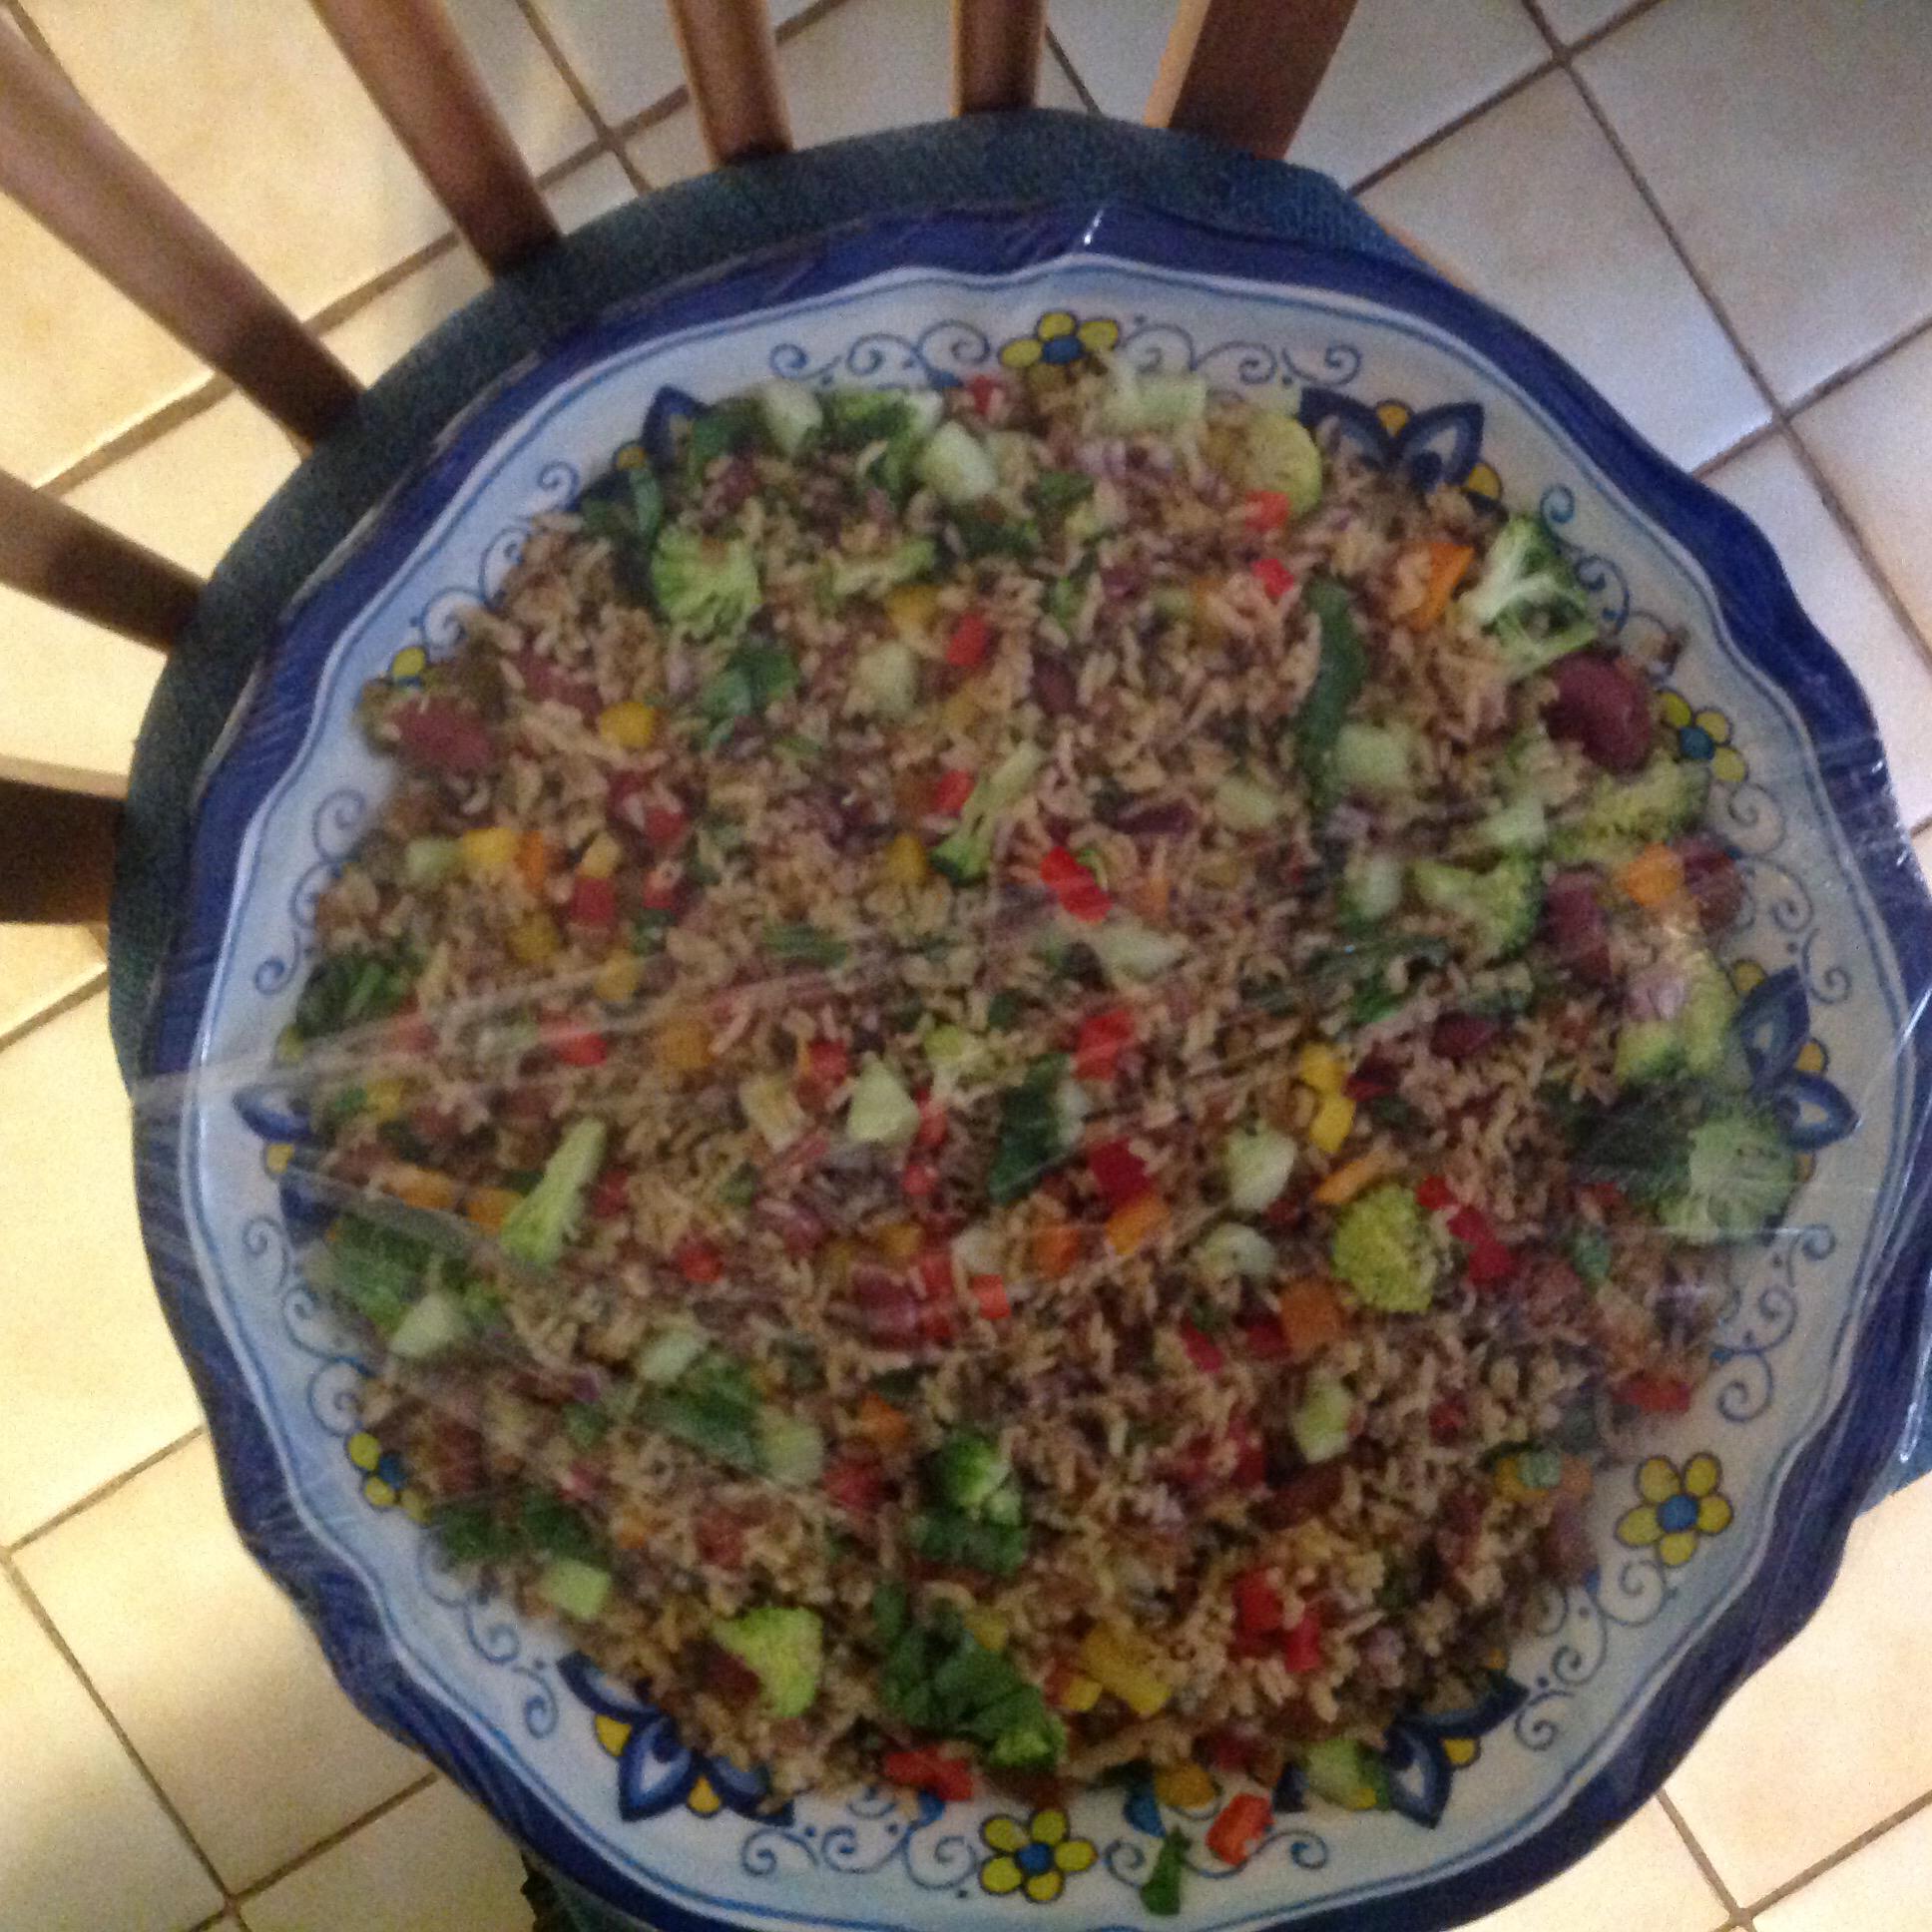 Nutty Brown Rice Salad lschaefer52